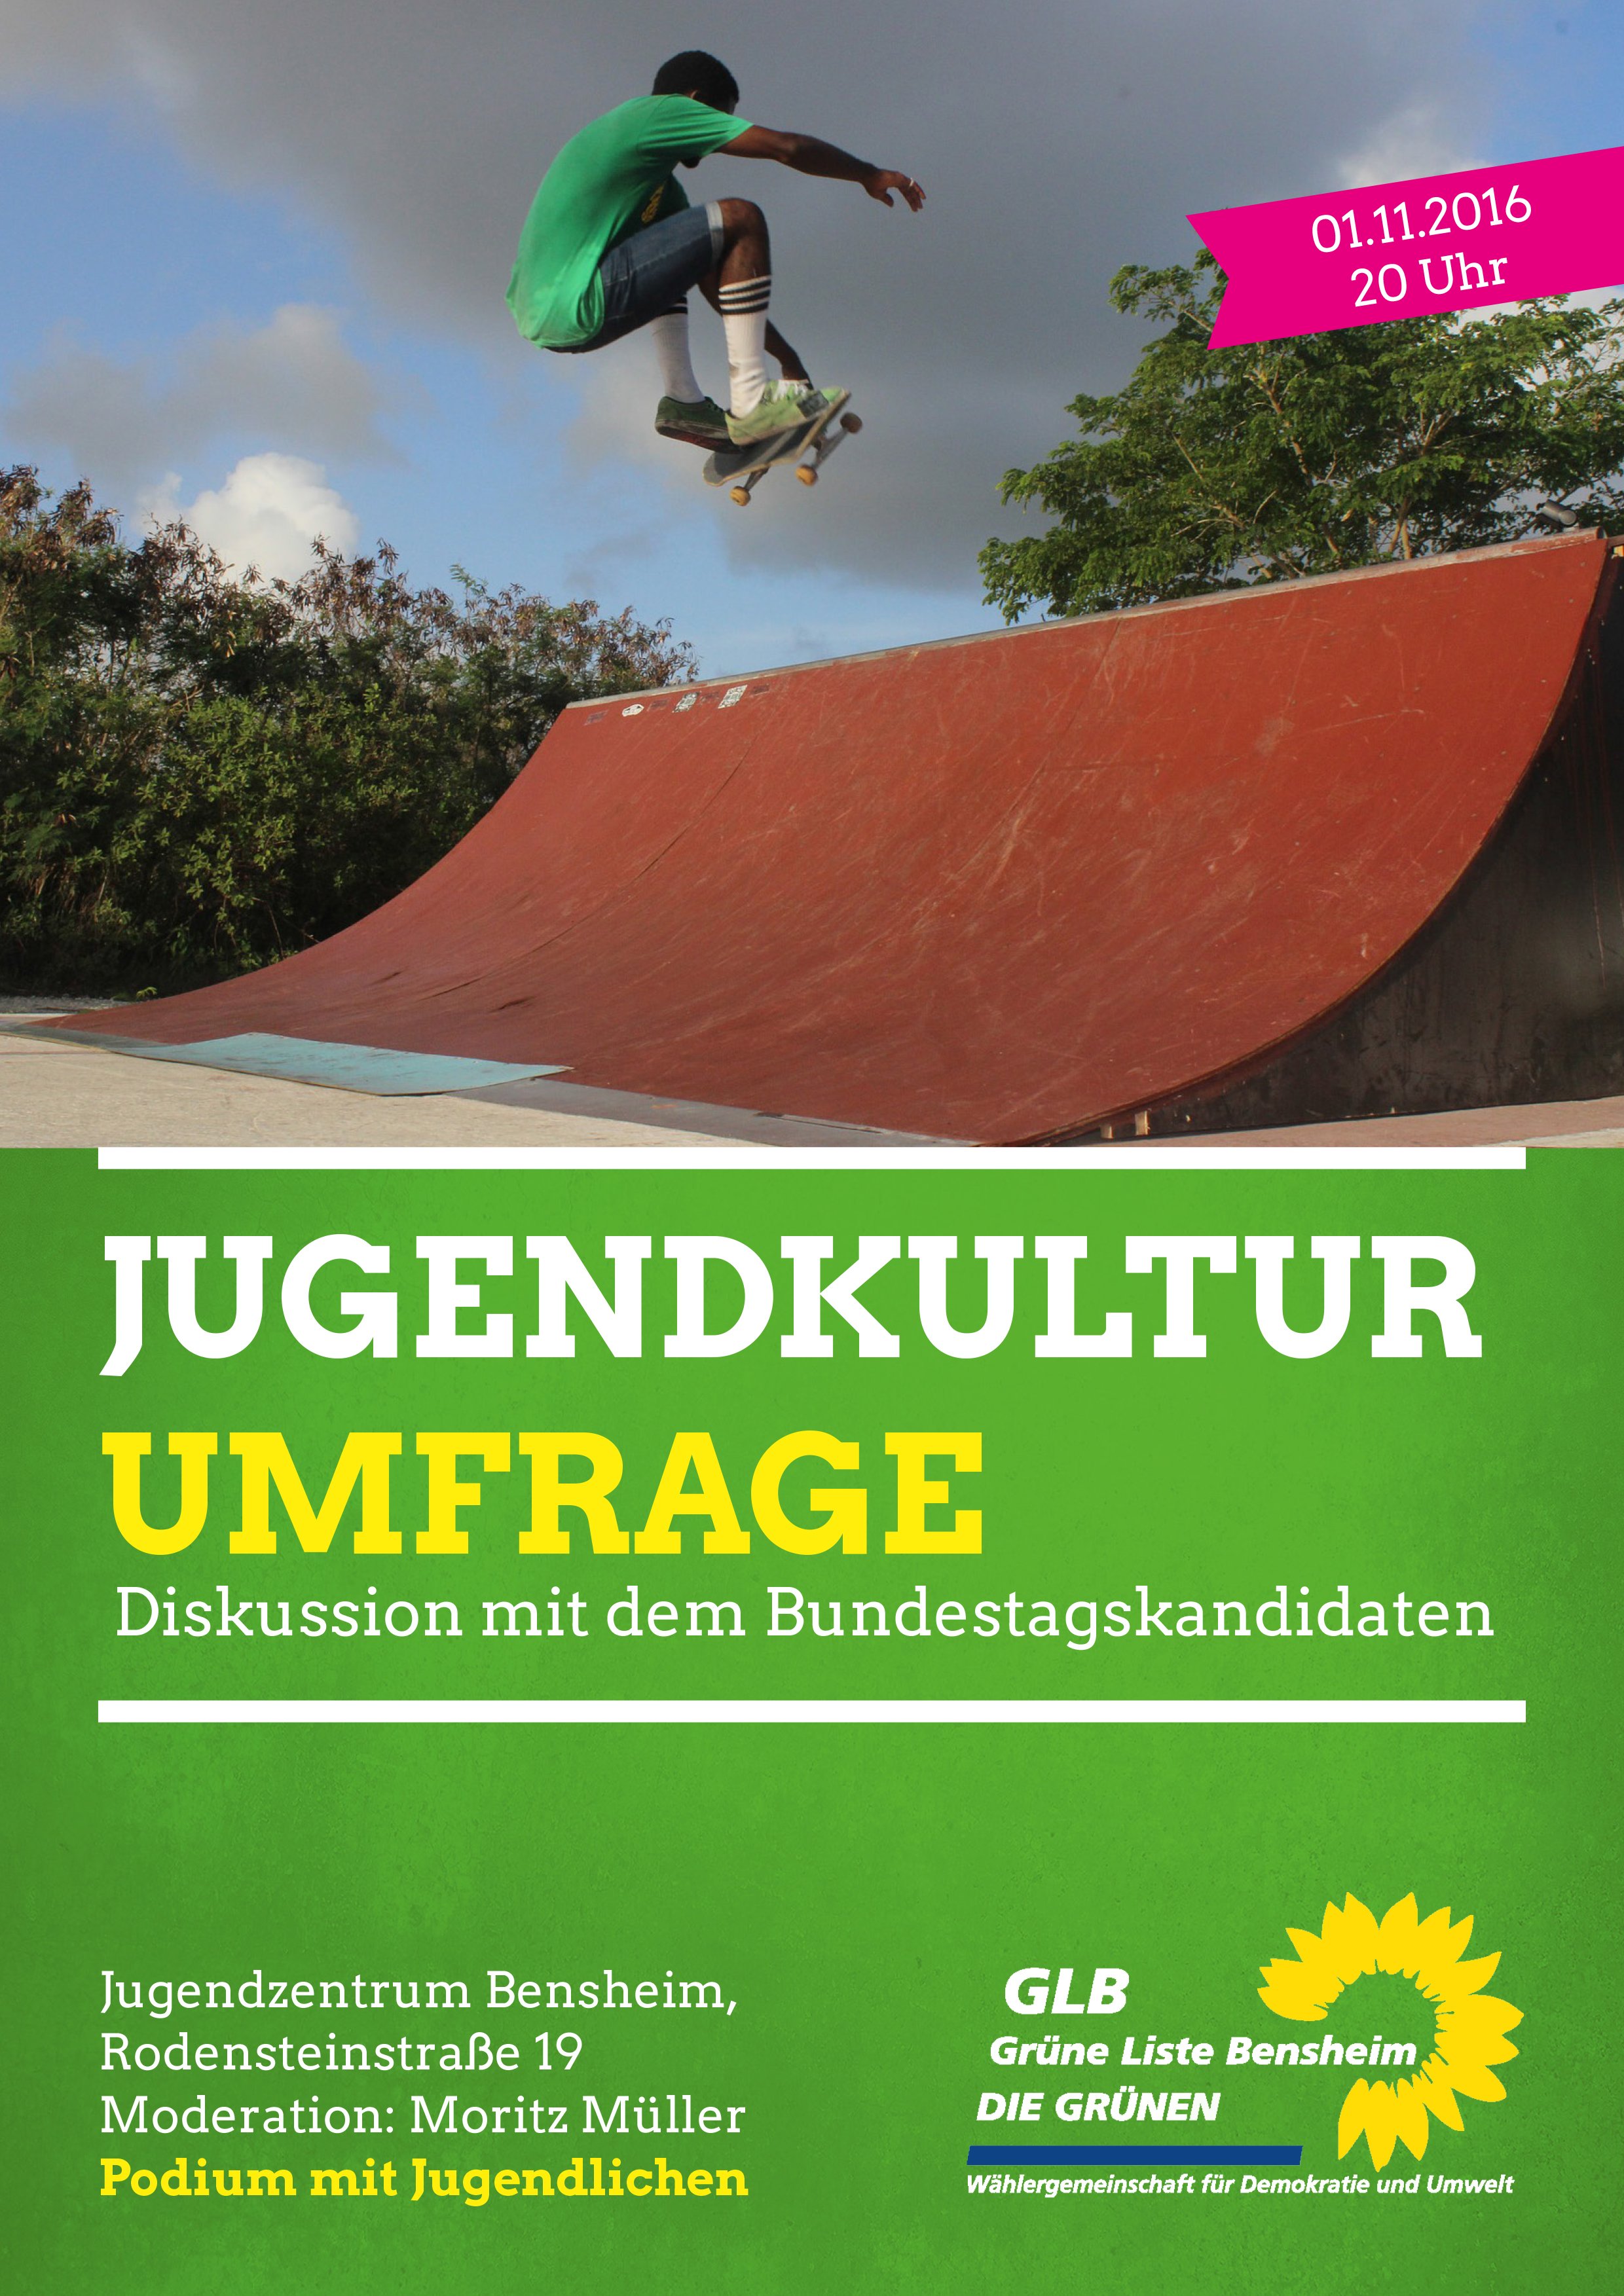 Grünes Podium zur Jugendkultur